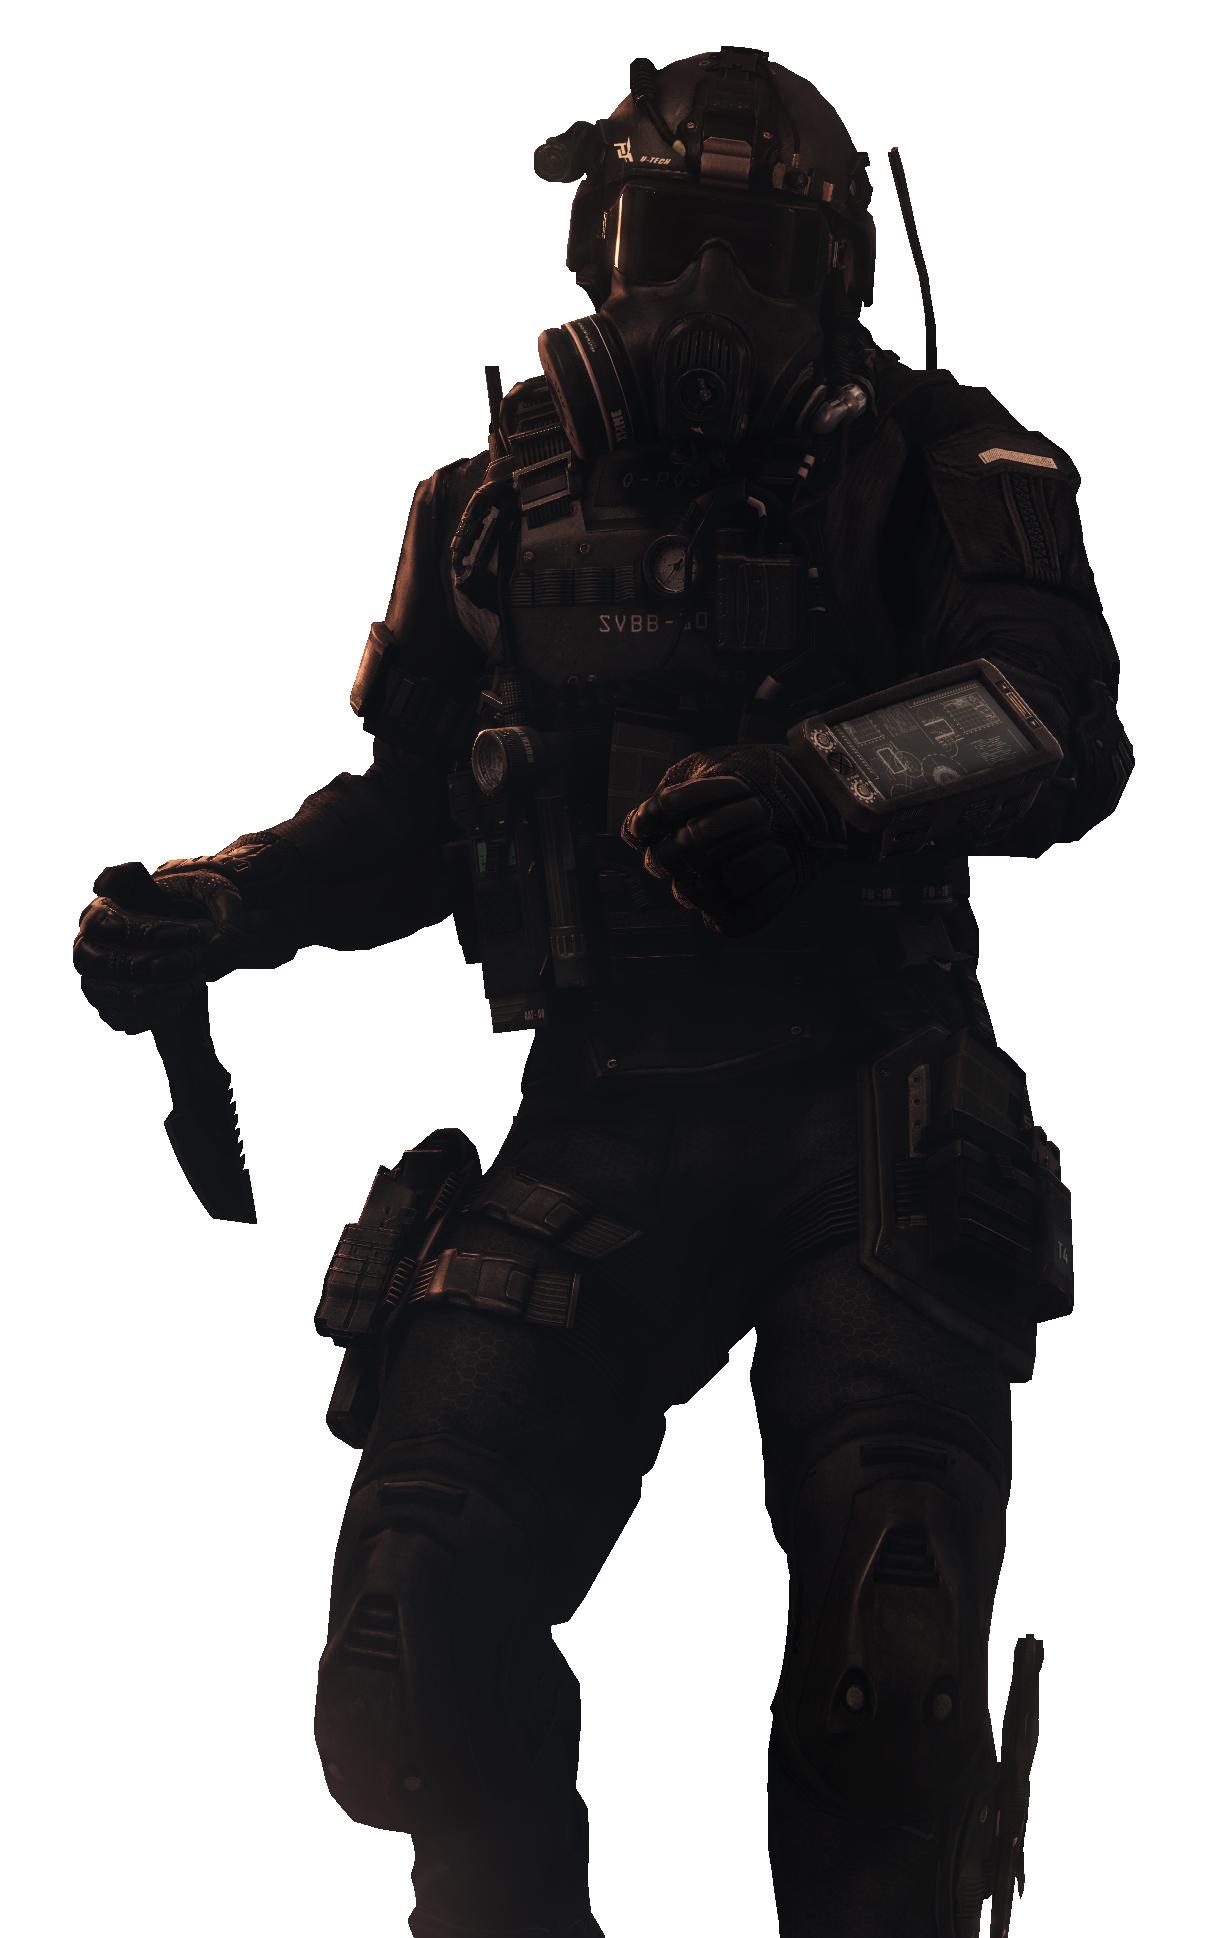 Call Of Duty Ghosts Knife Soldier Render By Ldelva On Deviantart